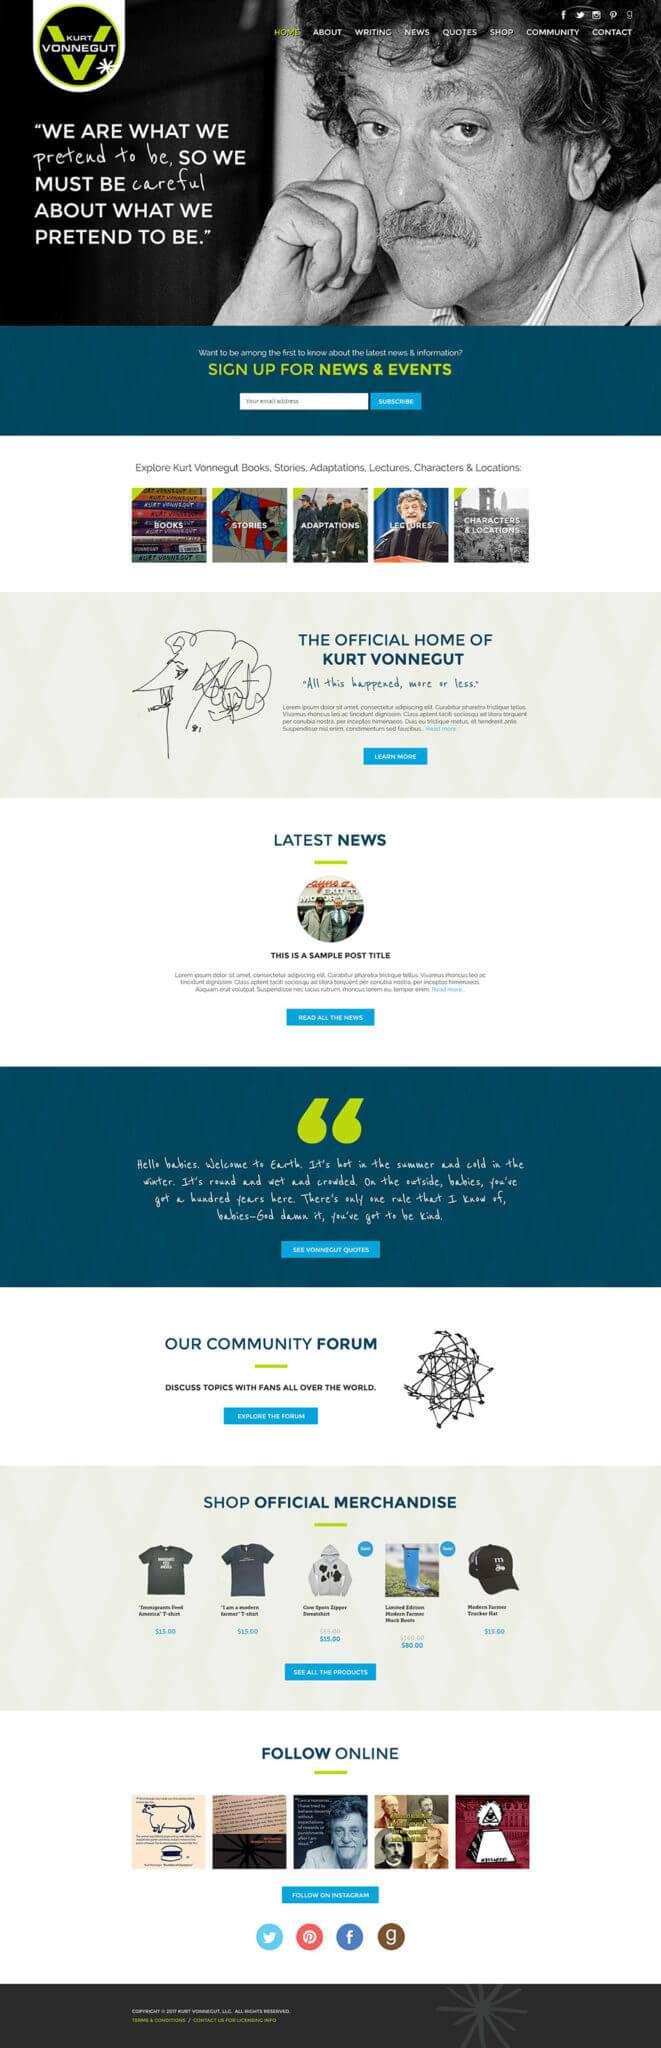 Kurt Vonnegut Author Website Design